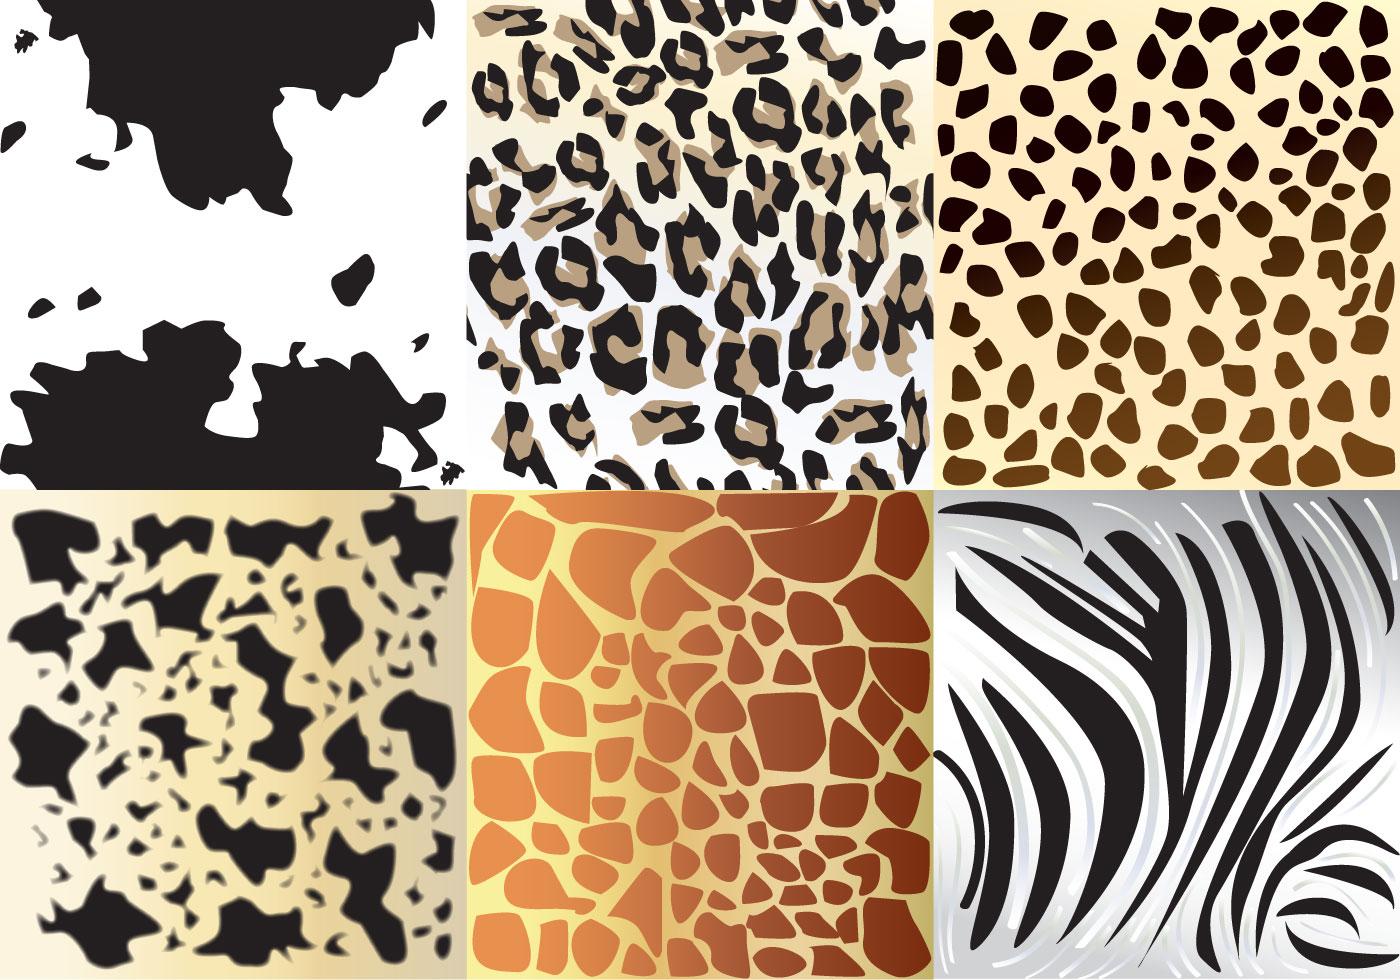 Cow Wallpaper Cute Animal Textures Download Free Vector Art Stock Graphics